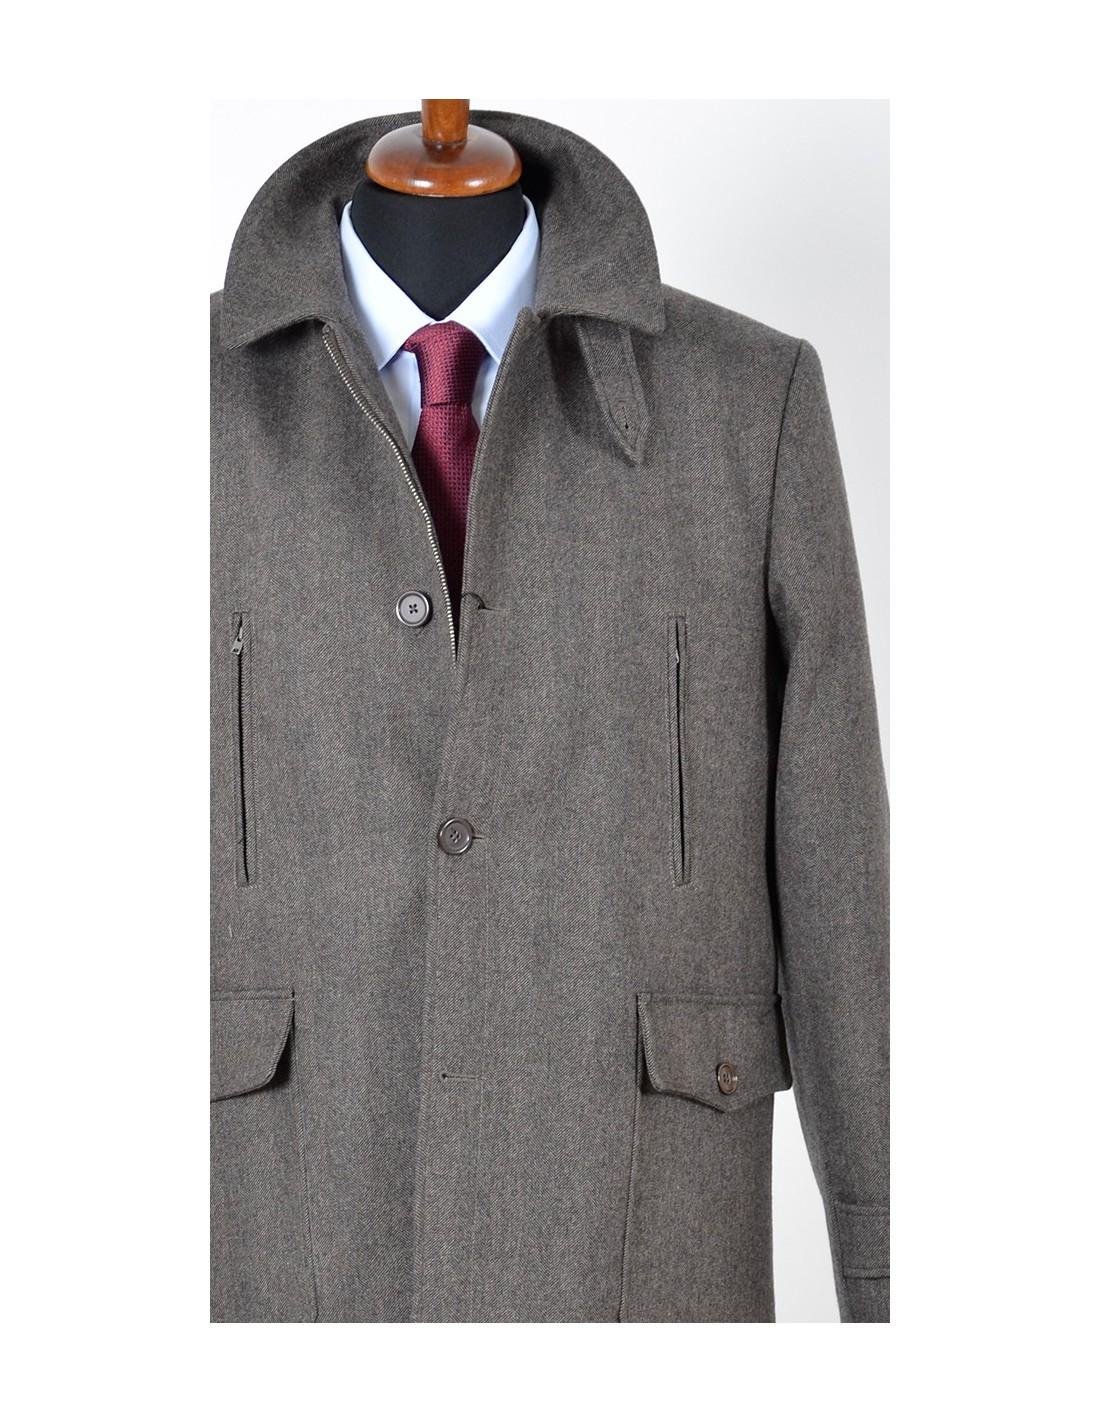 Giacconi invernali uomo in lana